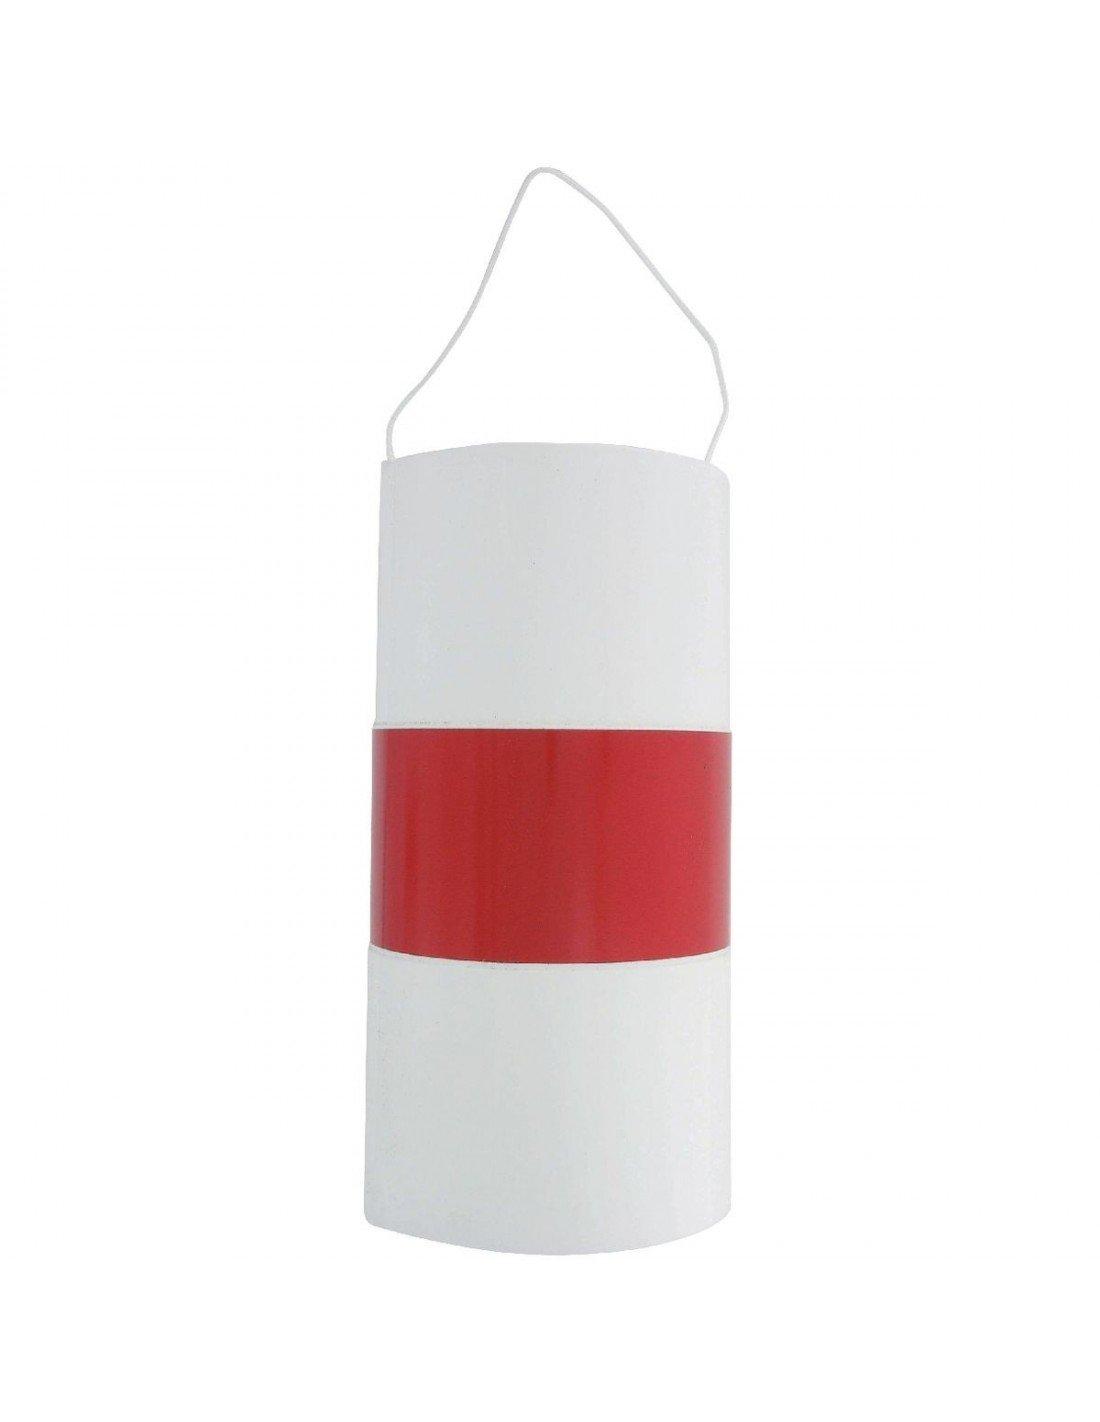 Outibat - Fardier / Ø 10 cm Bricodeal